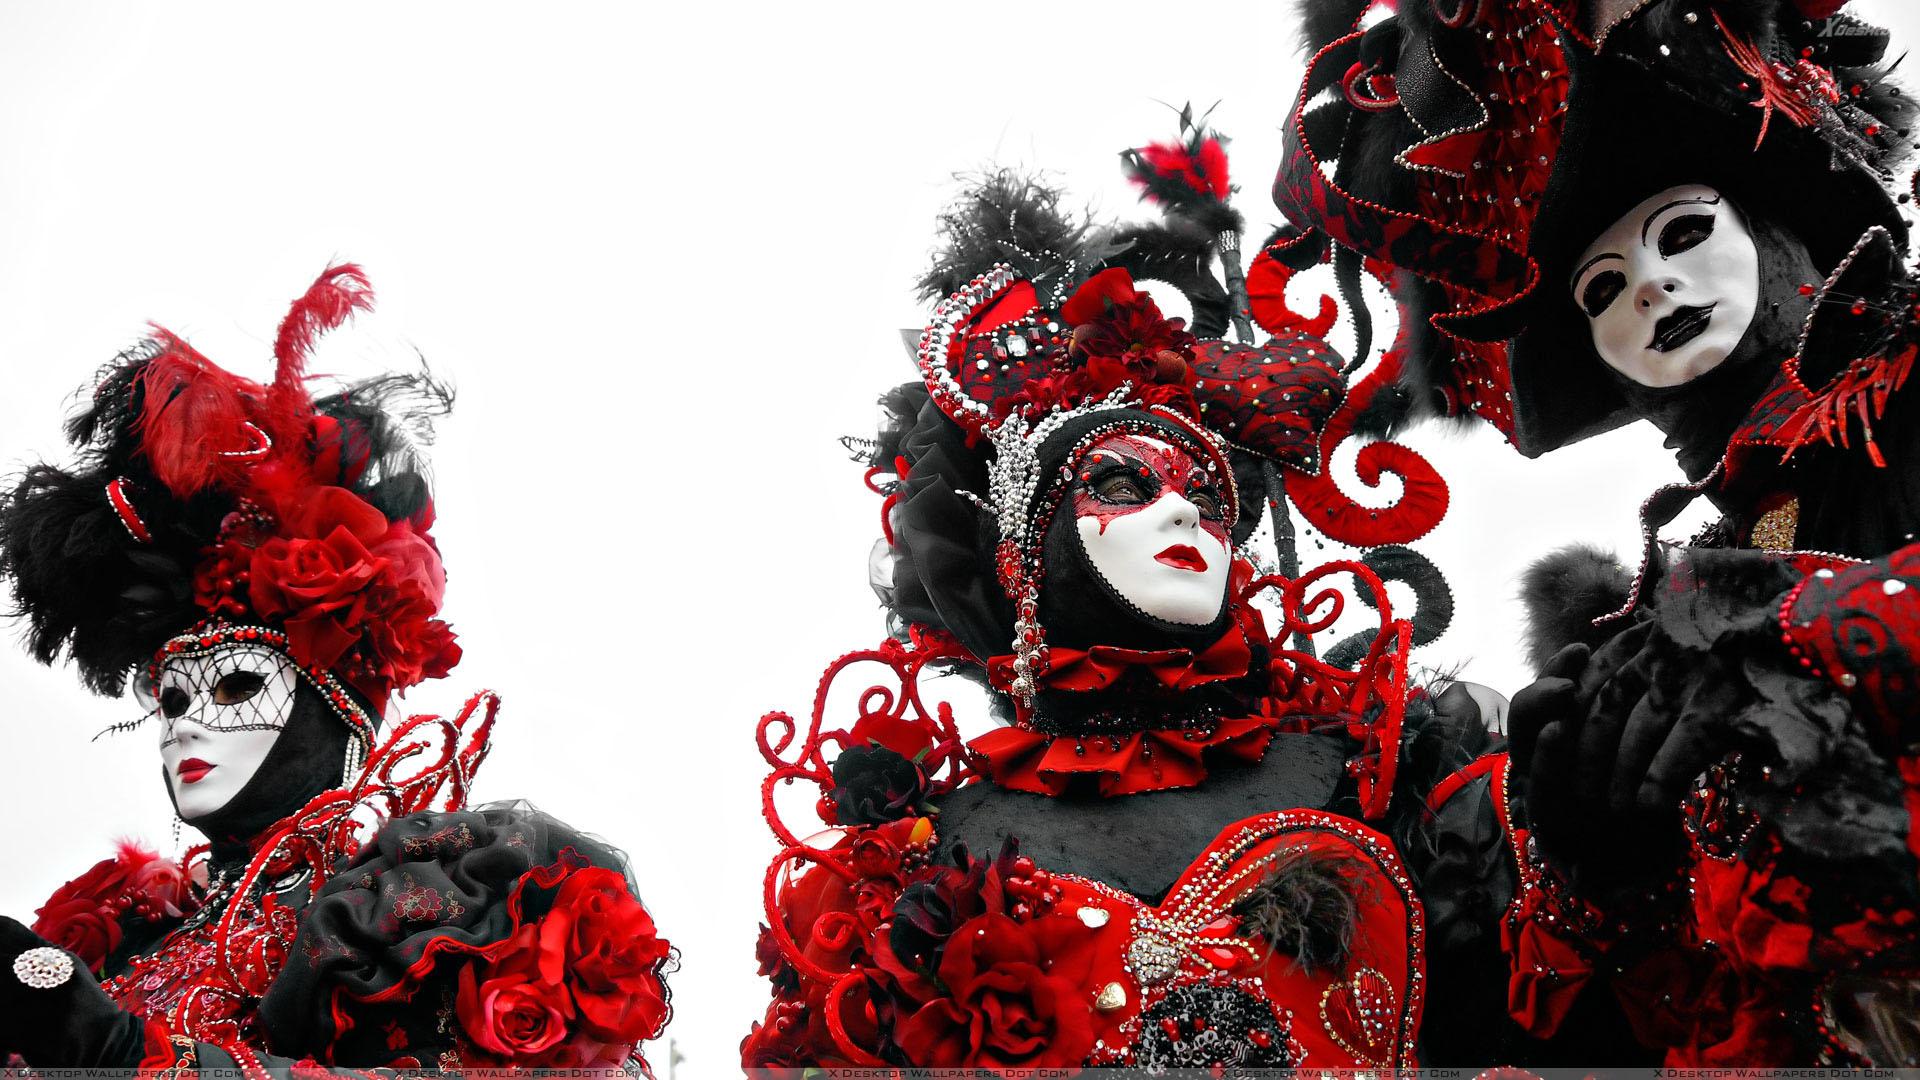 Red White and Black Wallpaper Desktop Image 1920x1080